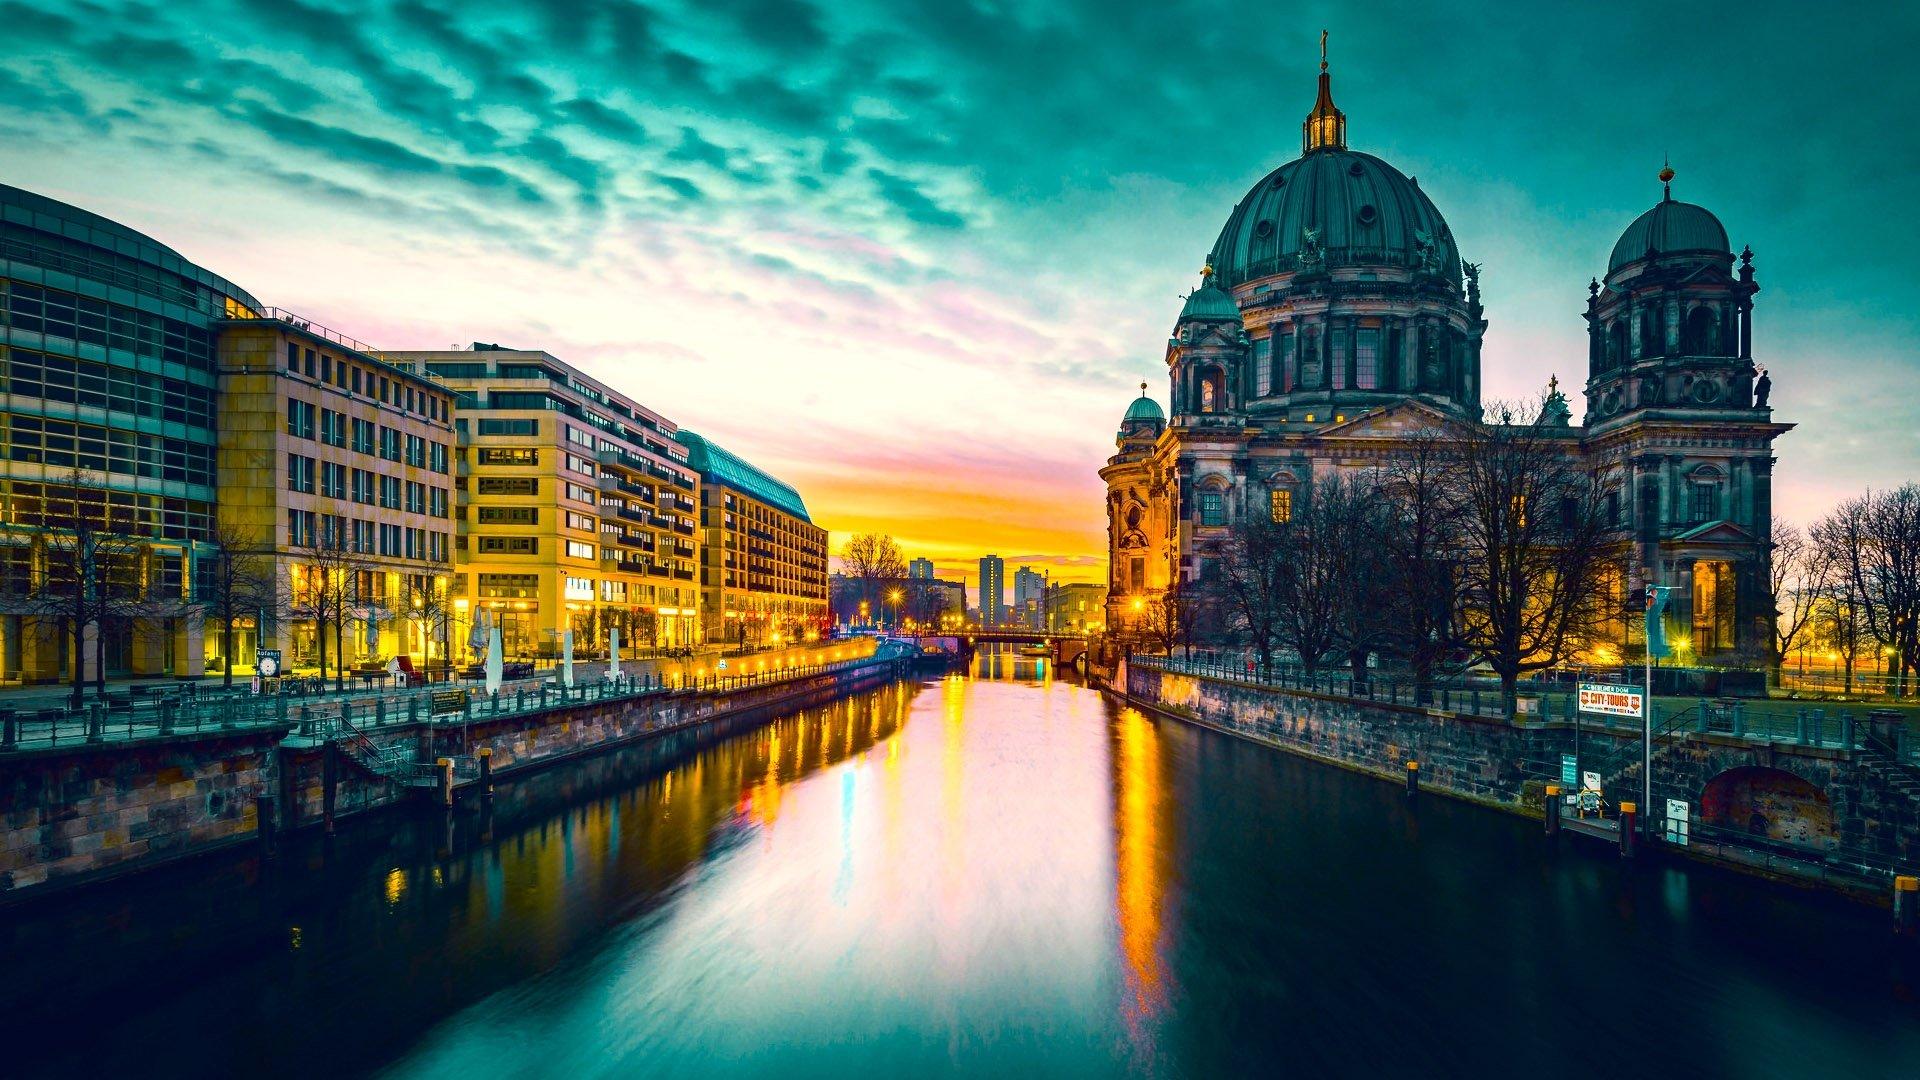 Berlin wallpaper picture hd